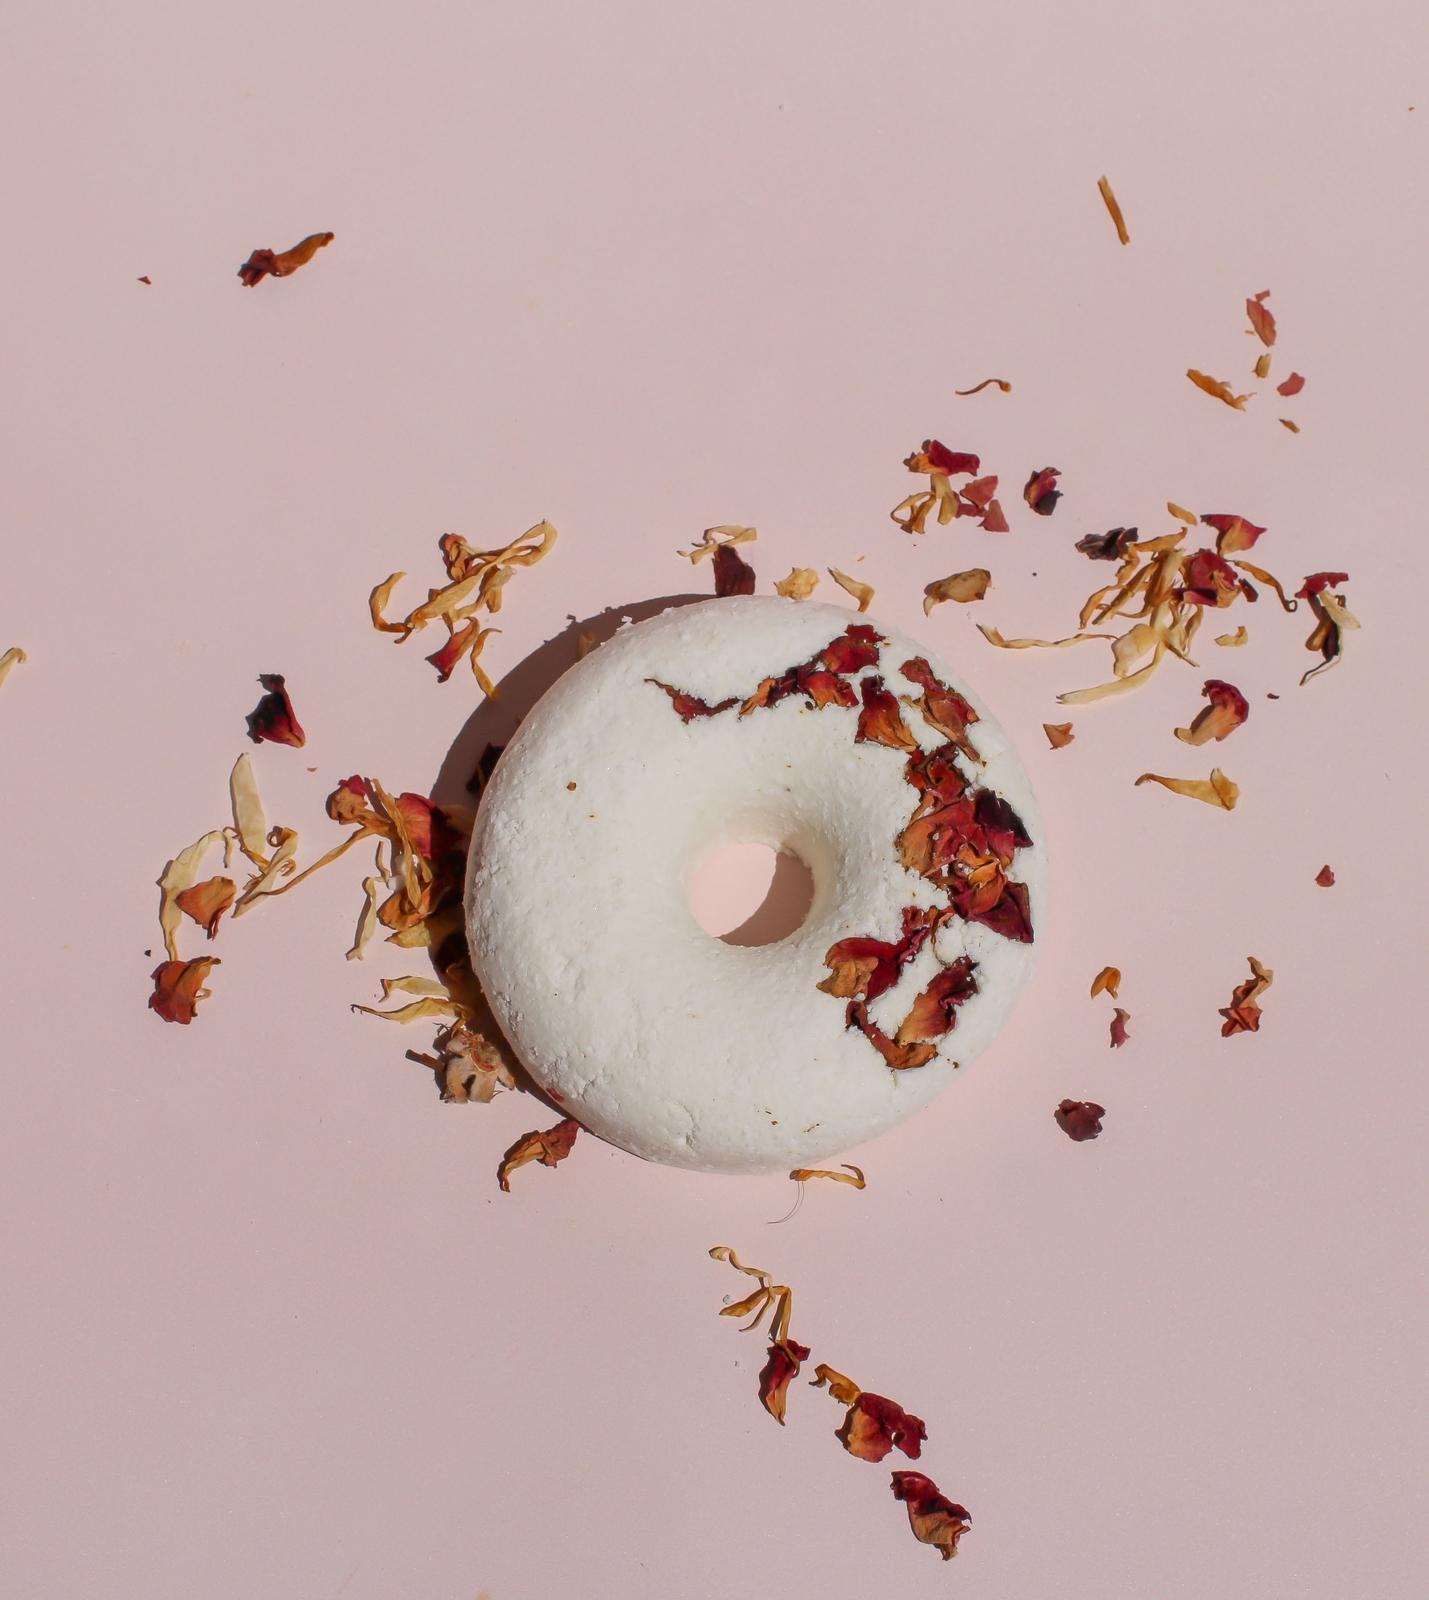 Bath bomb doughnuts